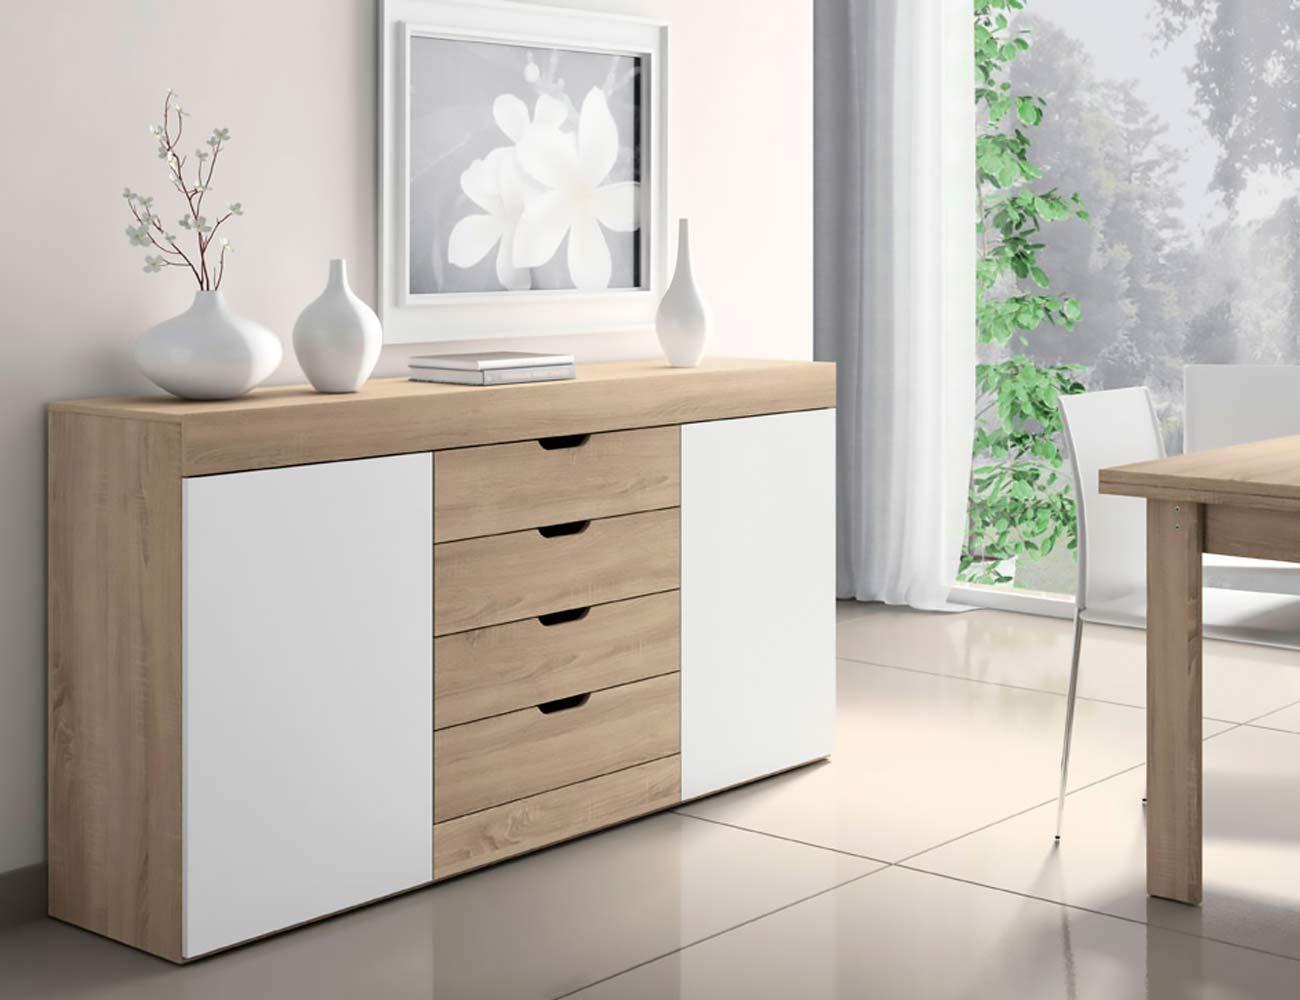 Mueble de salón estilo moderno en Cambrian con blanco (4608 ...